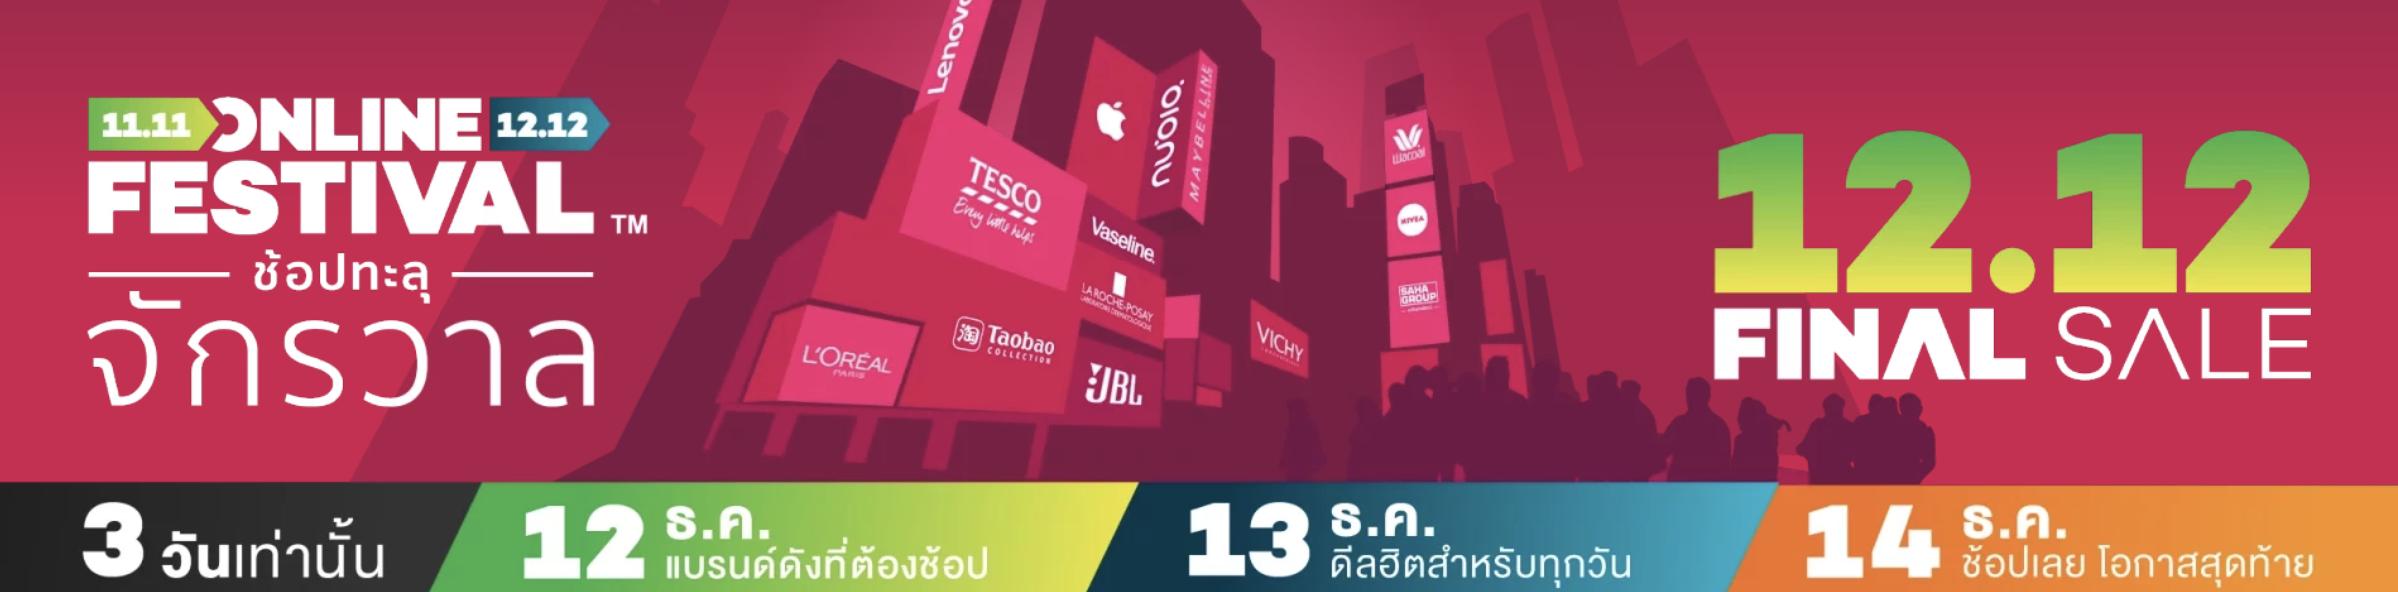 12.12 Lazada Online Festival